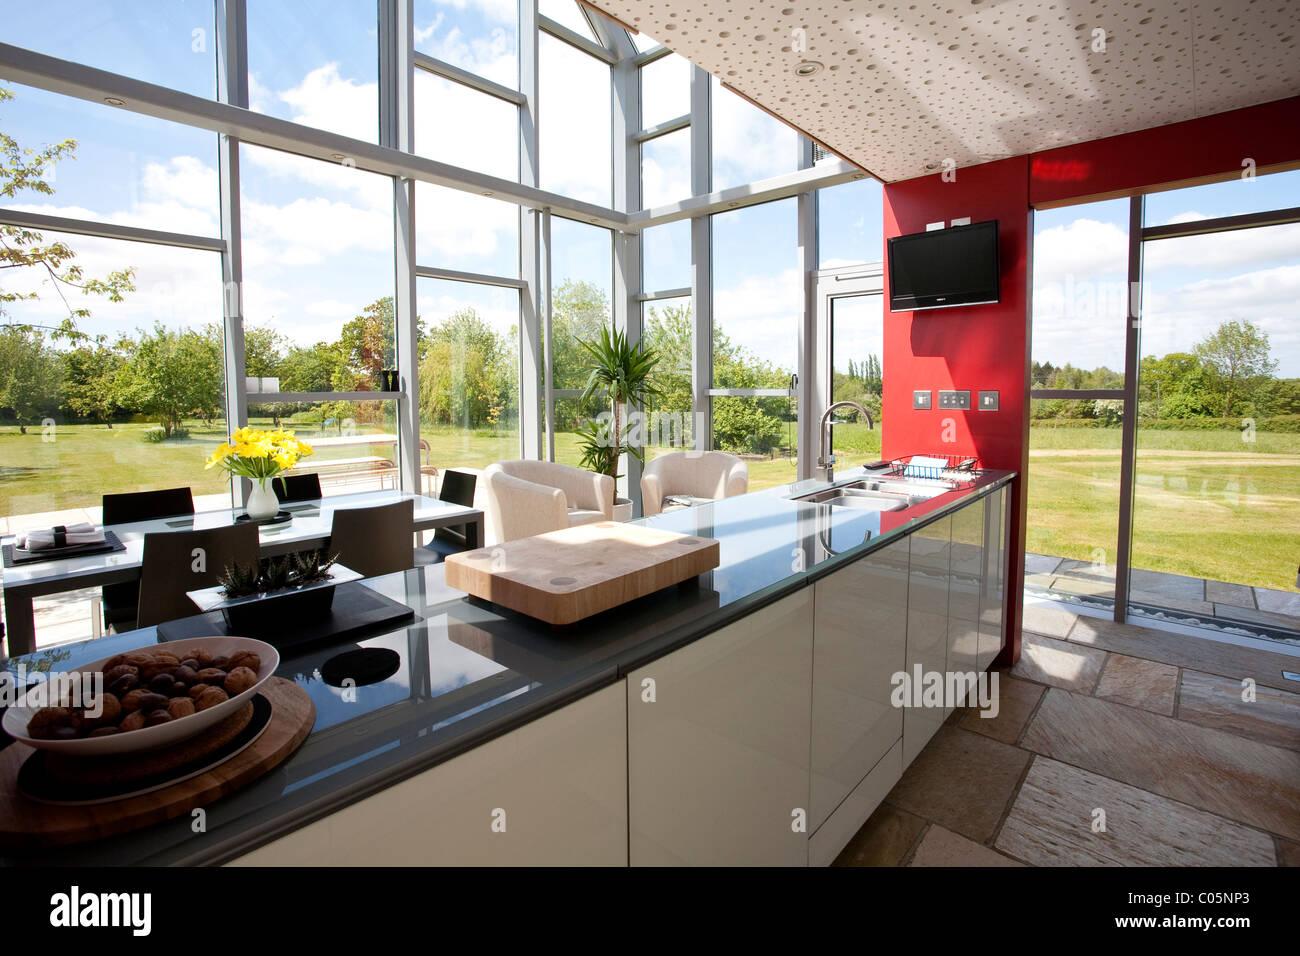 Open Plan Kitchen The Sliding House Suffolk England. Photo:Jeff Gilbert - Stock Image